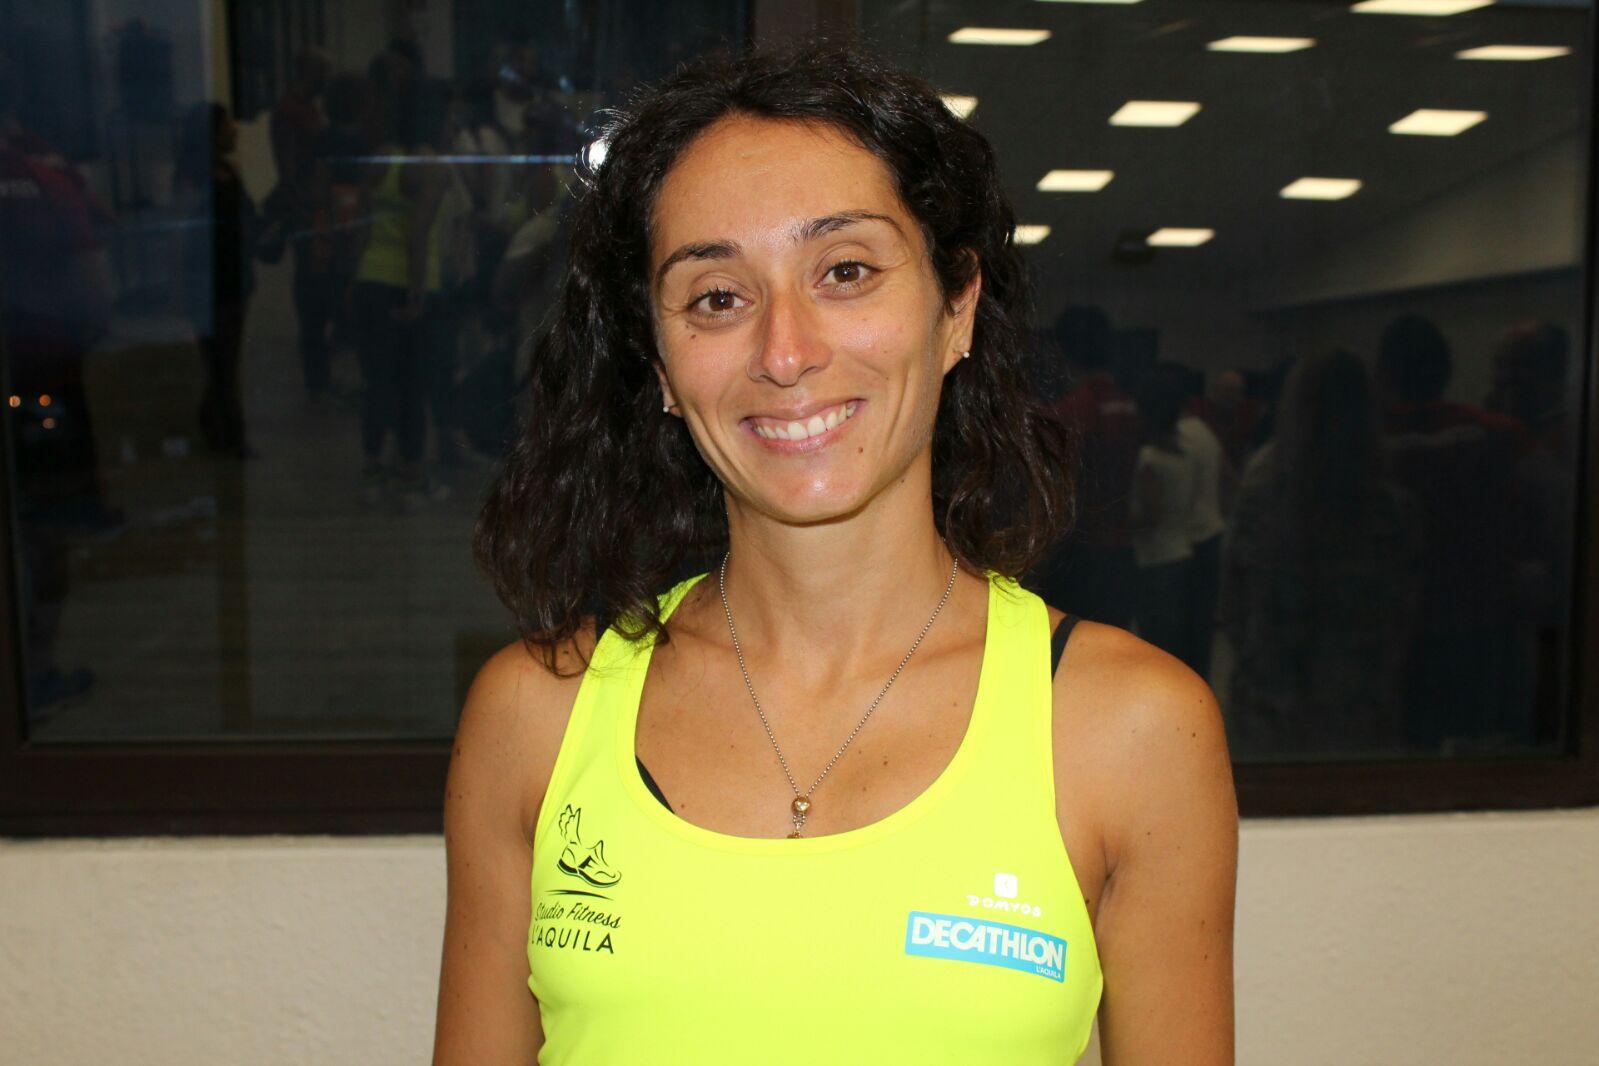 Roberta Giannitto